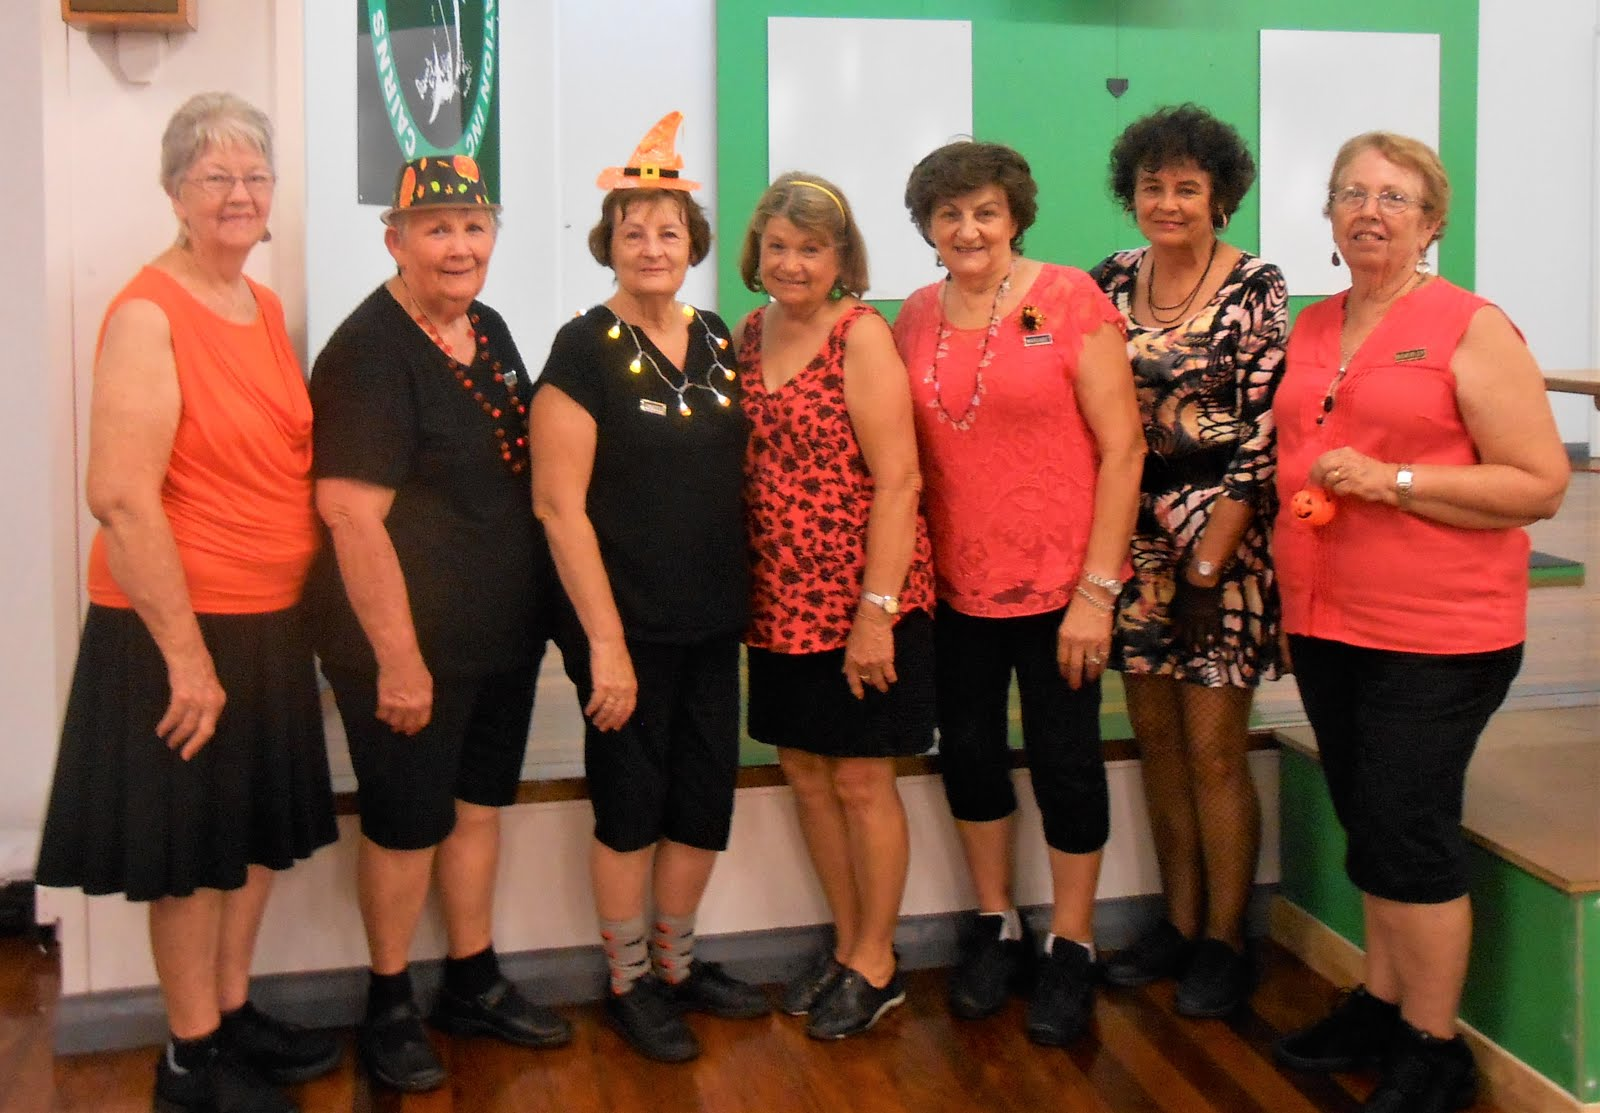 Coasters at Cairns'  Halloween Social